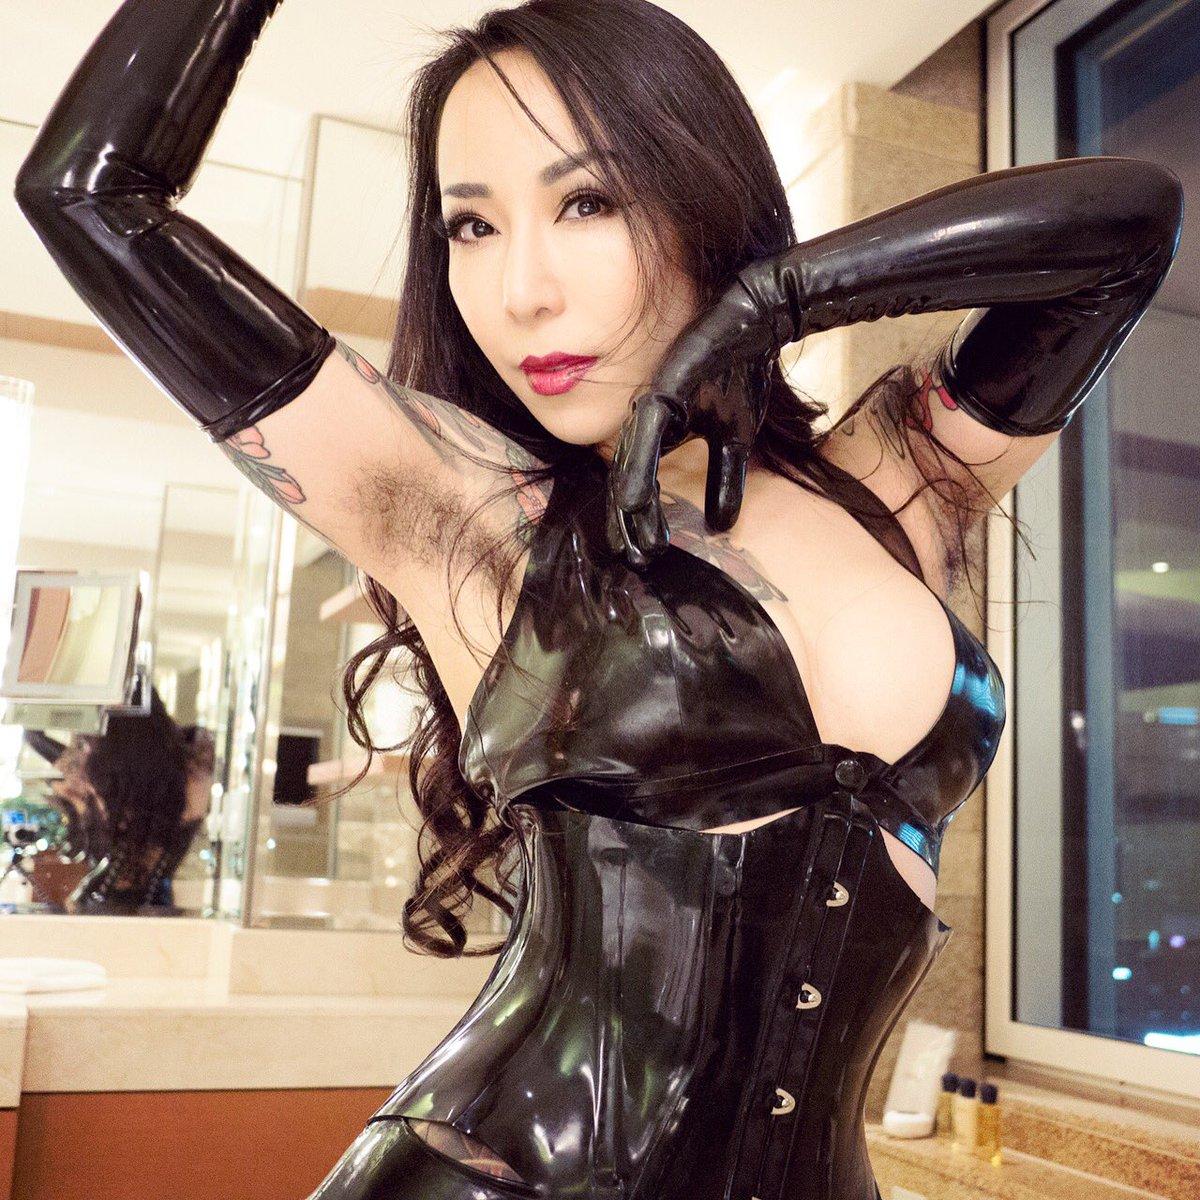 #latexmistress #mistress #japanesemistre...